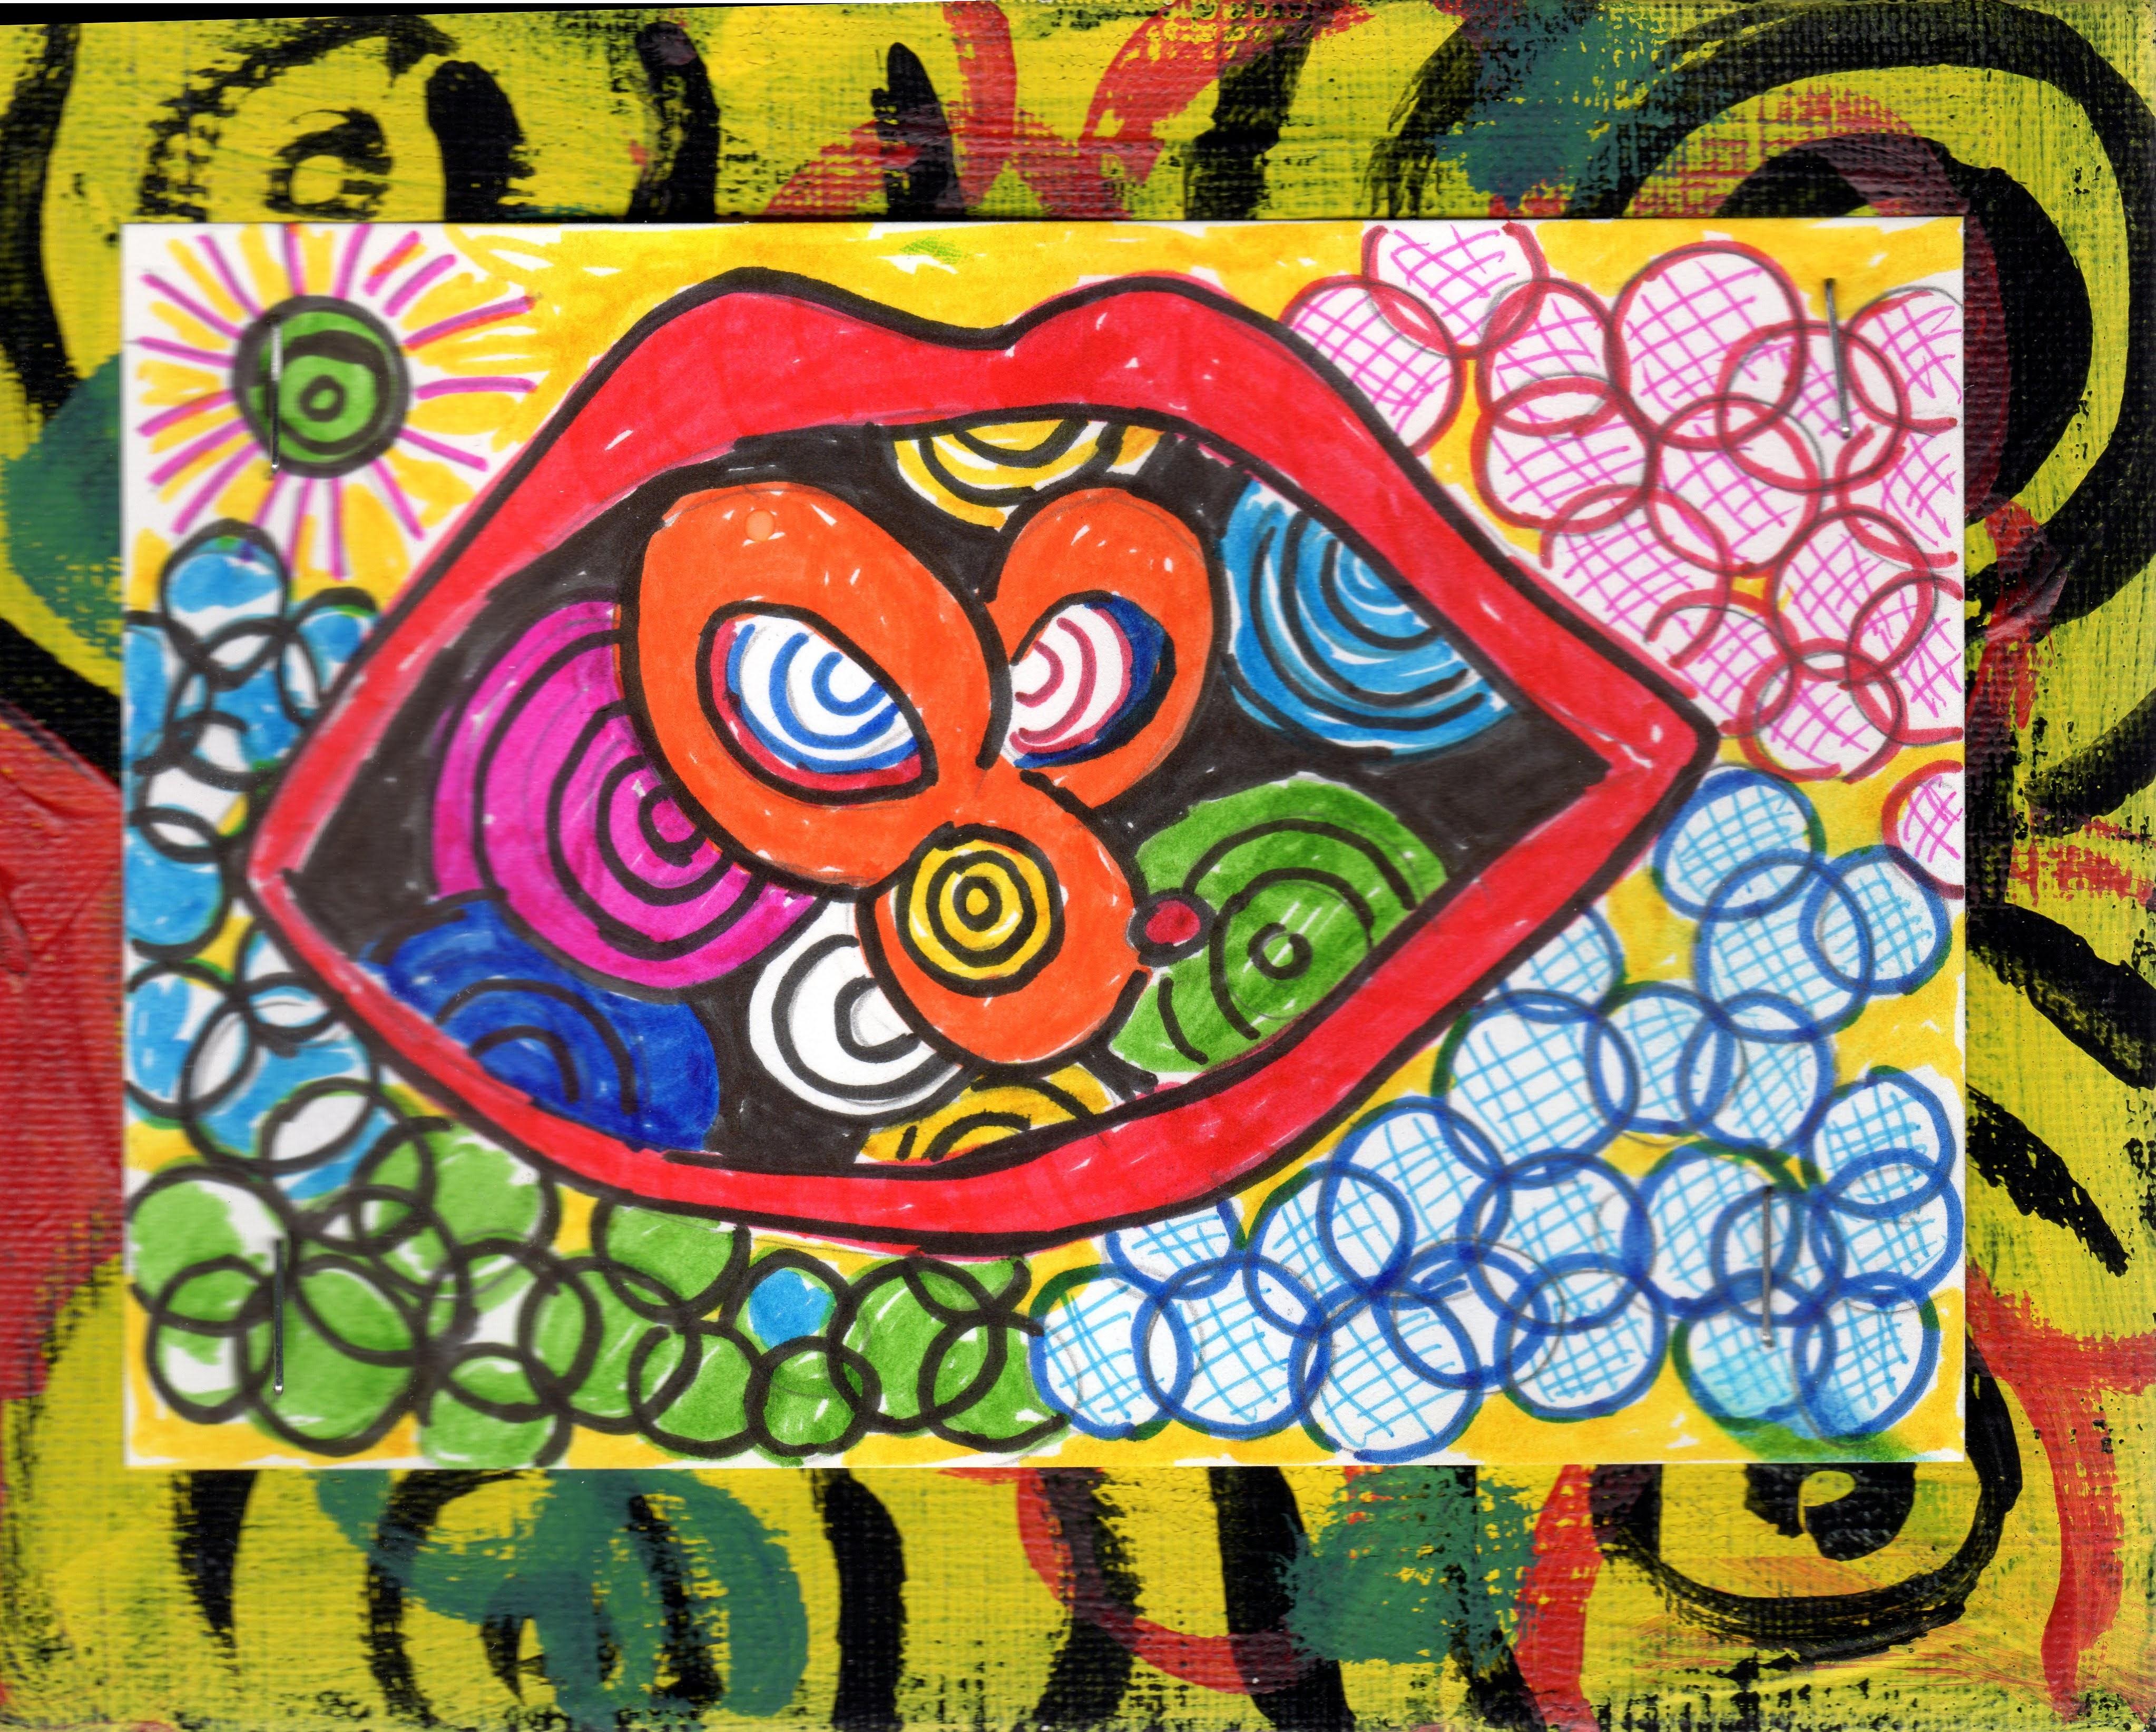 [mouse in a mouth] - Ito, Yoko's art work   [口の中のネズミ] - 伊藤洋子の美術